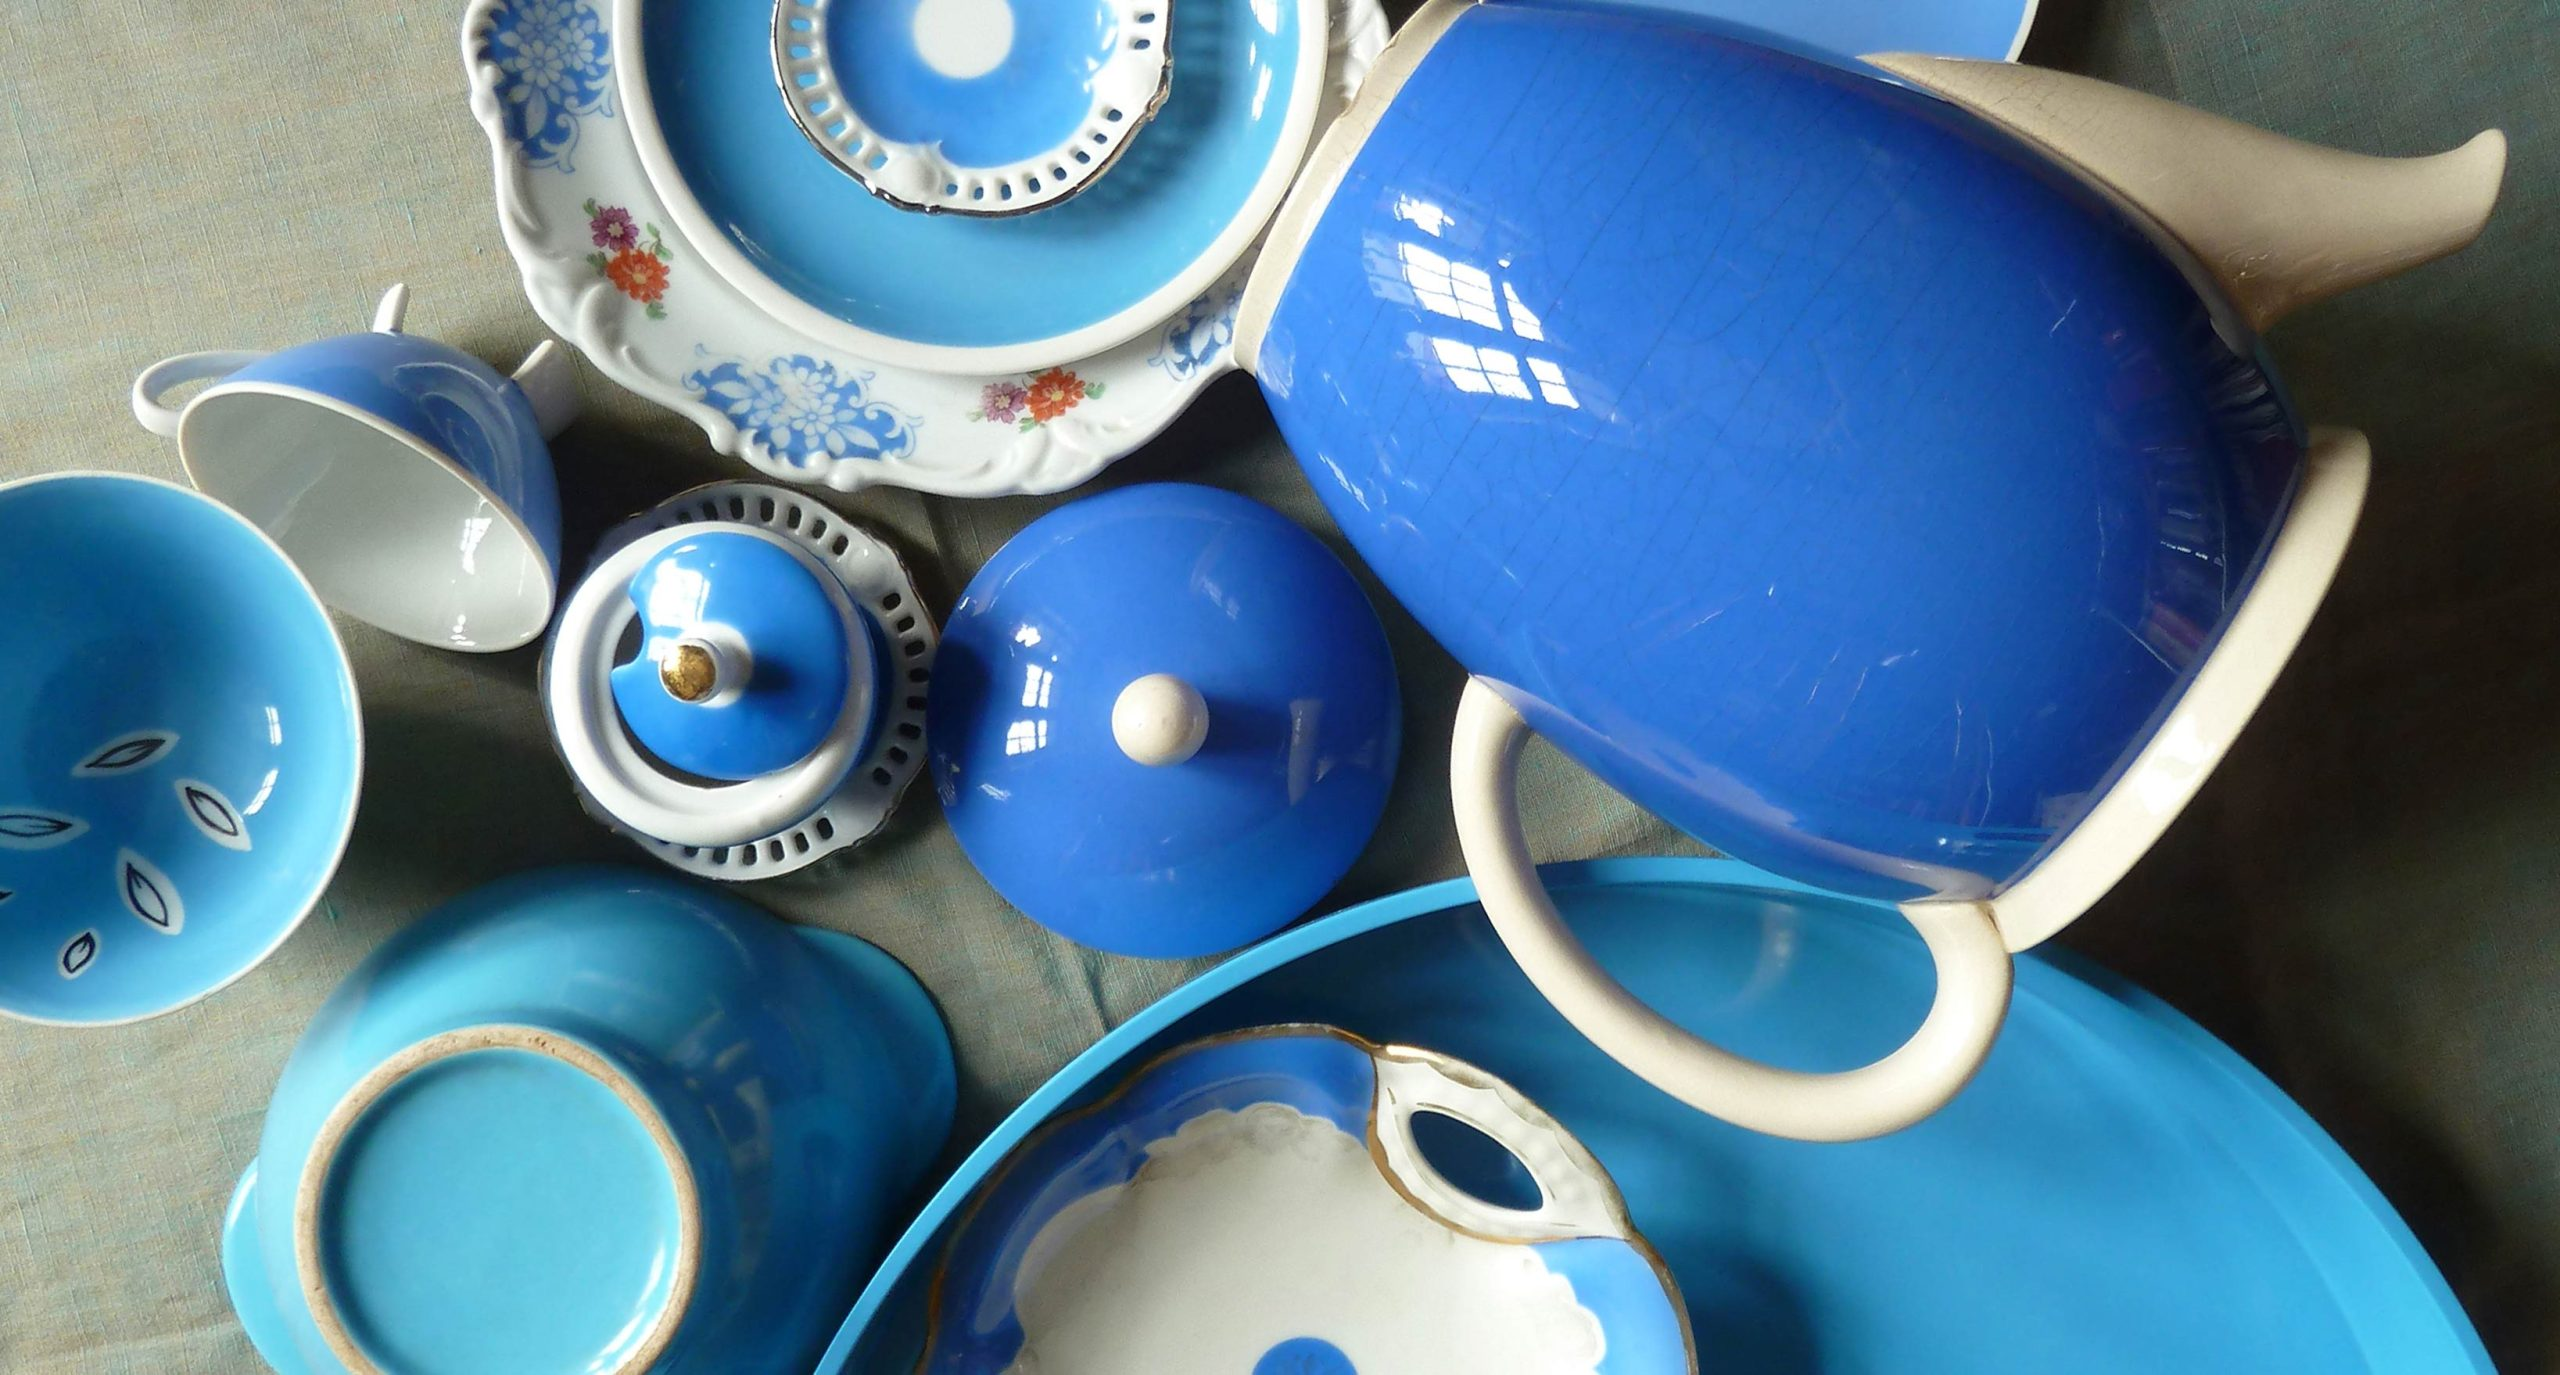 Himmelblau Stimmung Stylingfotografie Porzellan